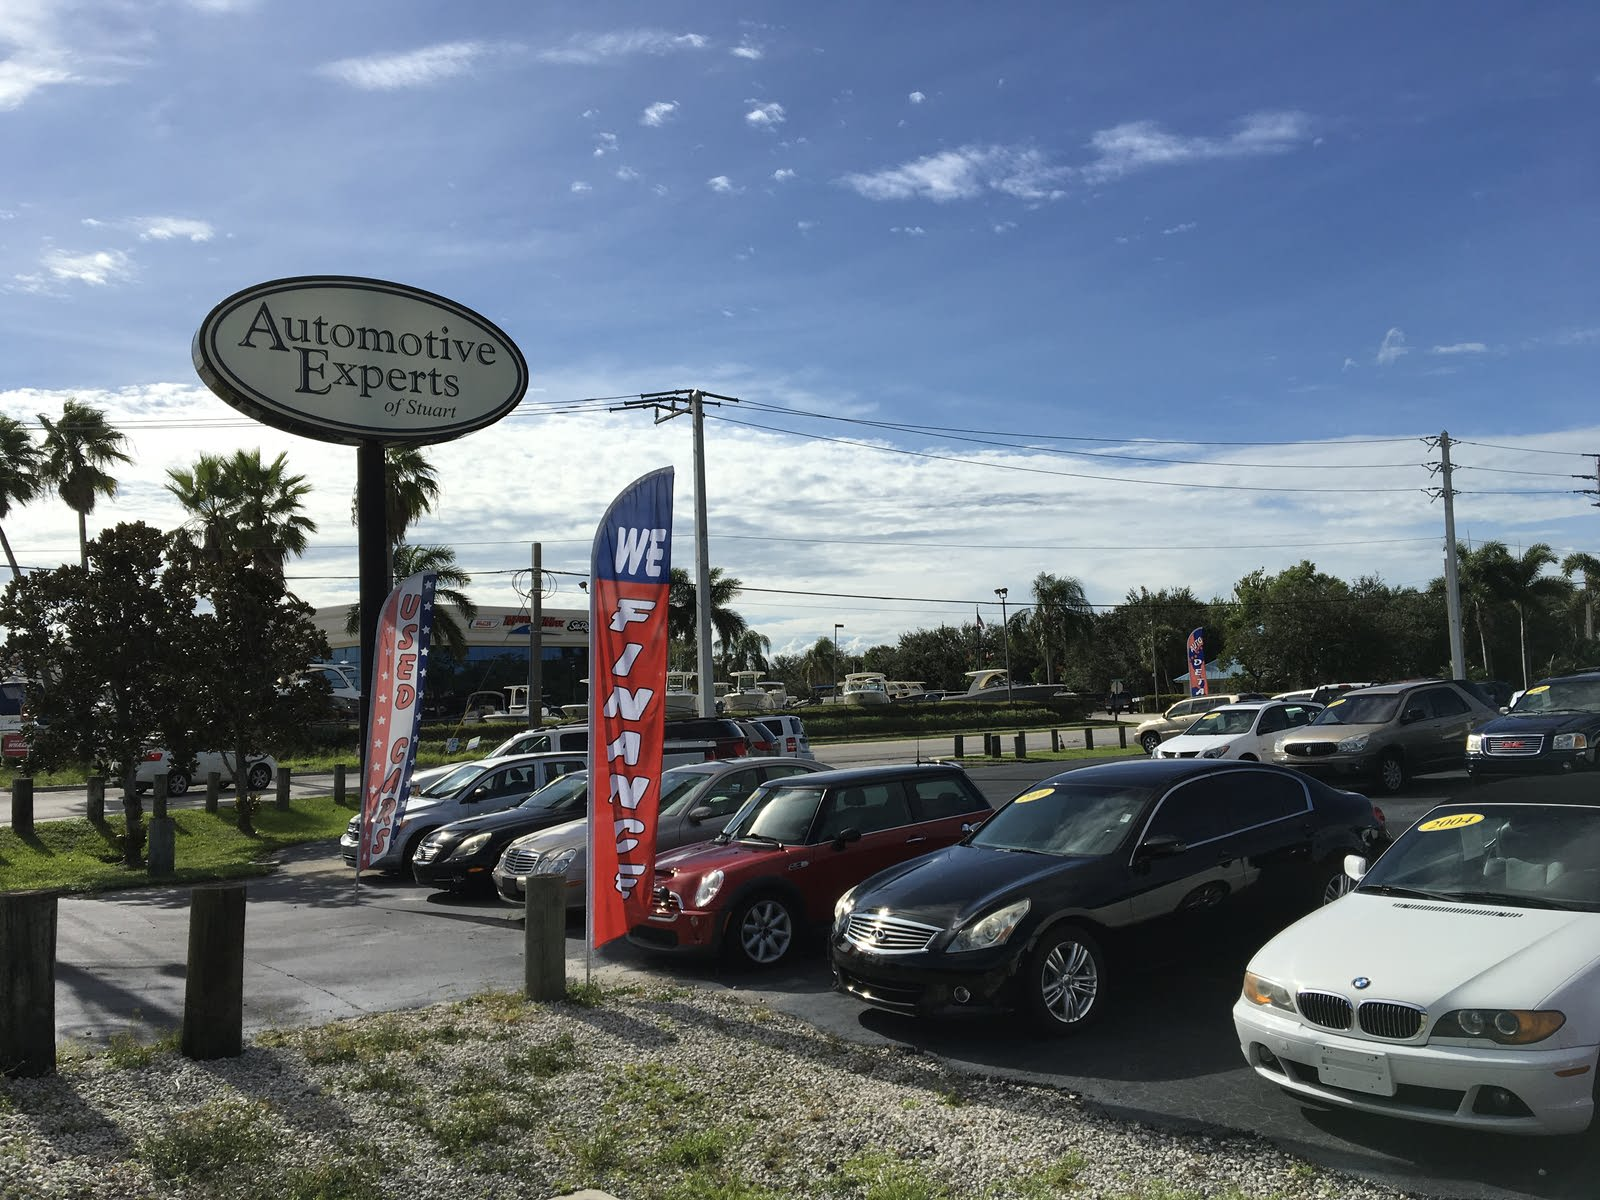 Automotive Experts Of Stuart - Stuart, FL: Read Consumer ...